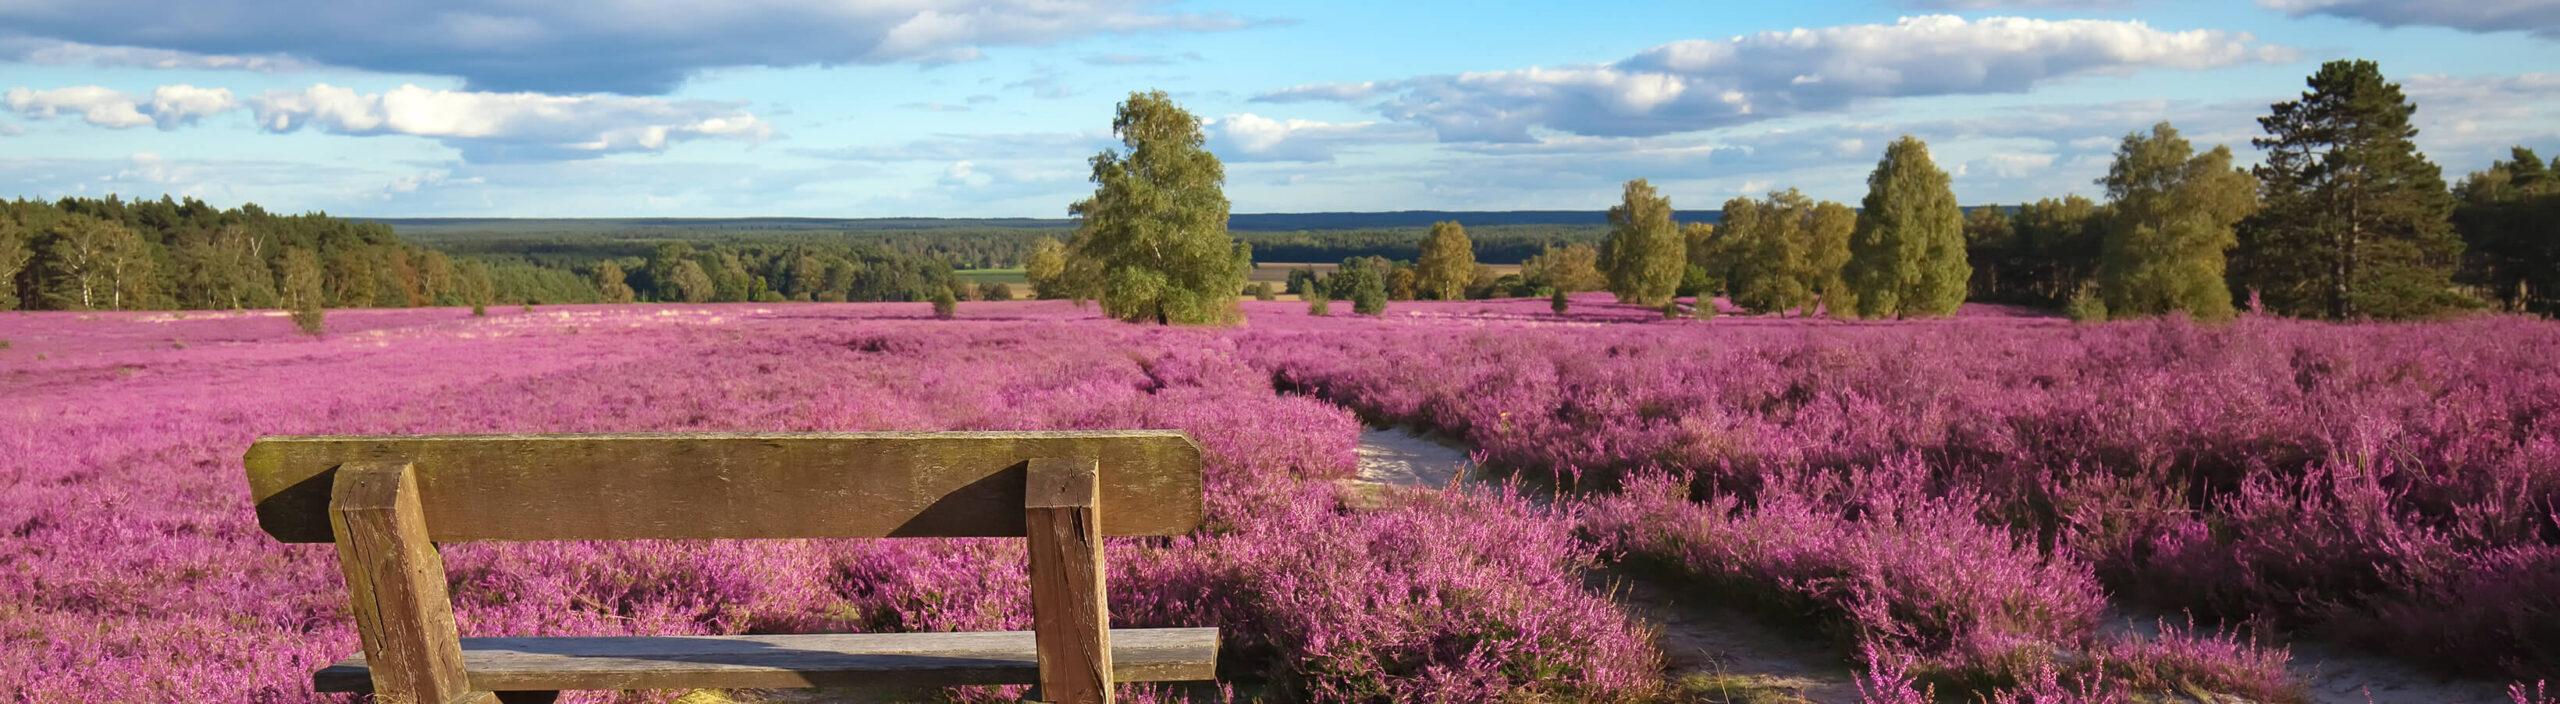 Naturcamping Lüneburger Heide - Unsere Partner